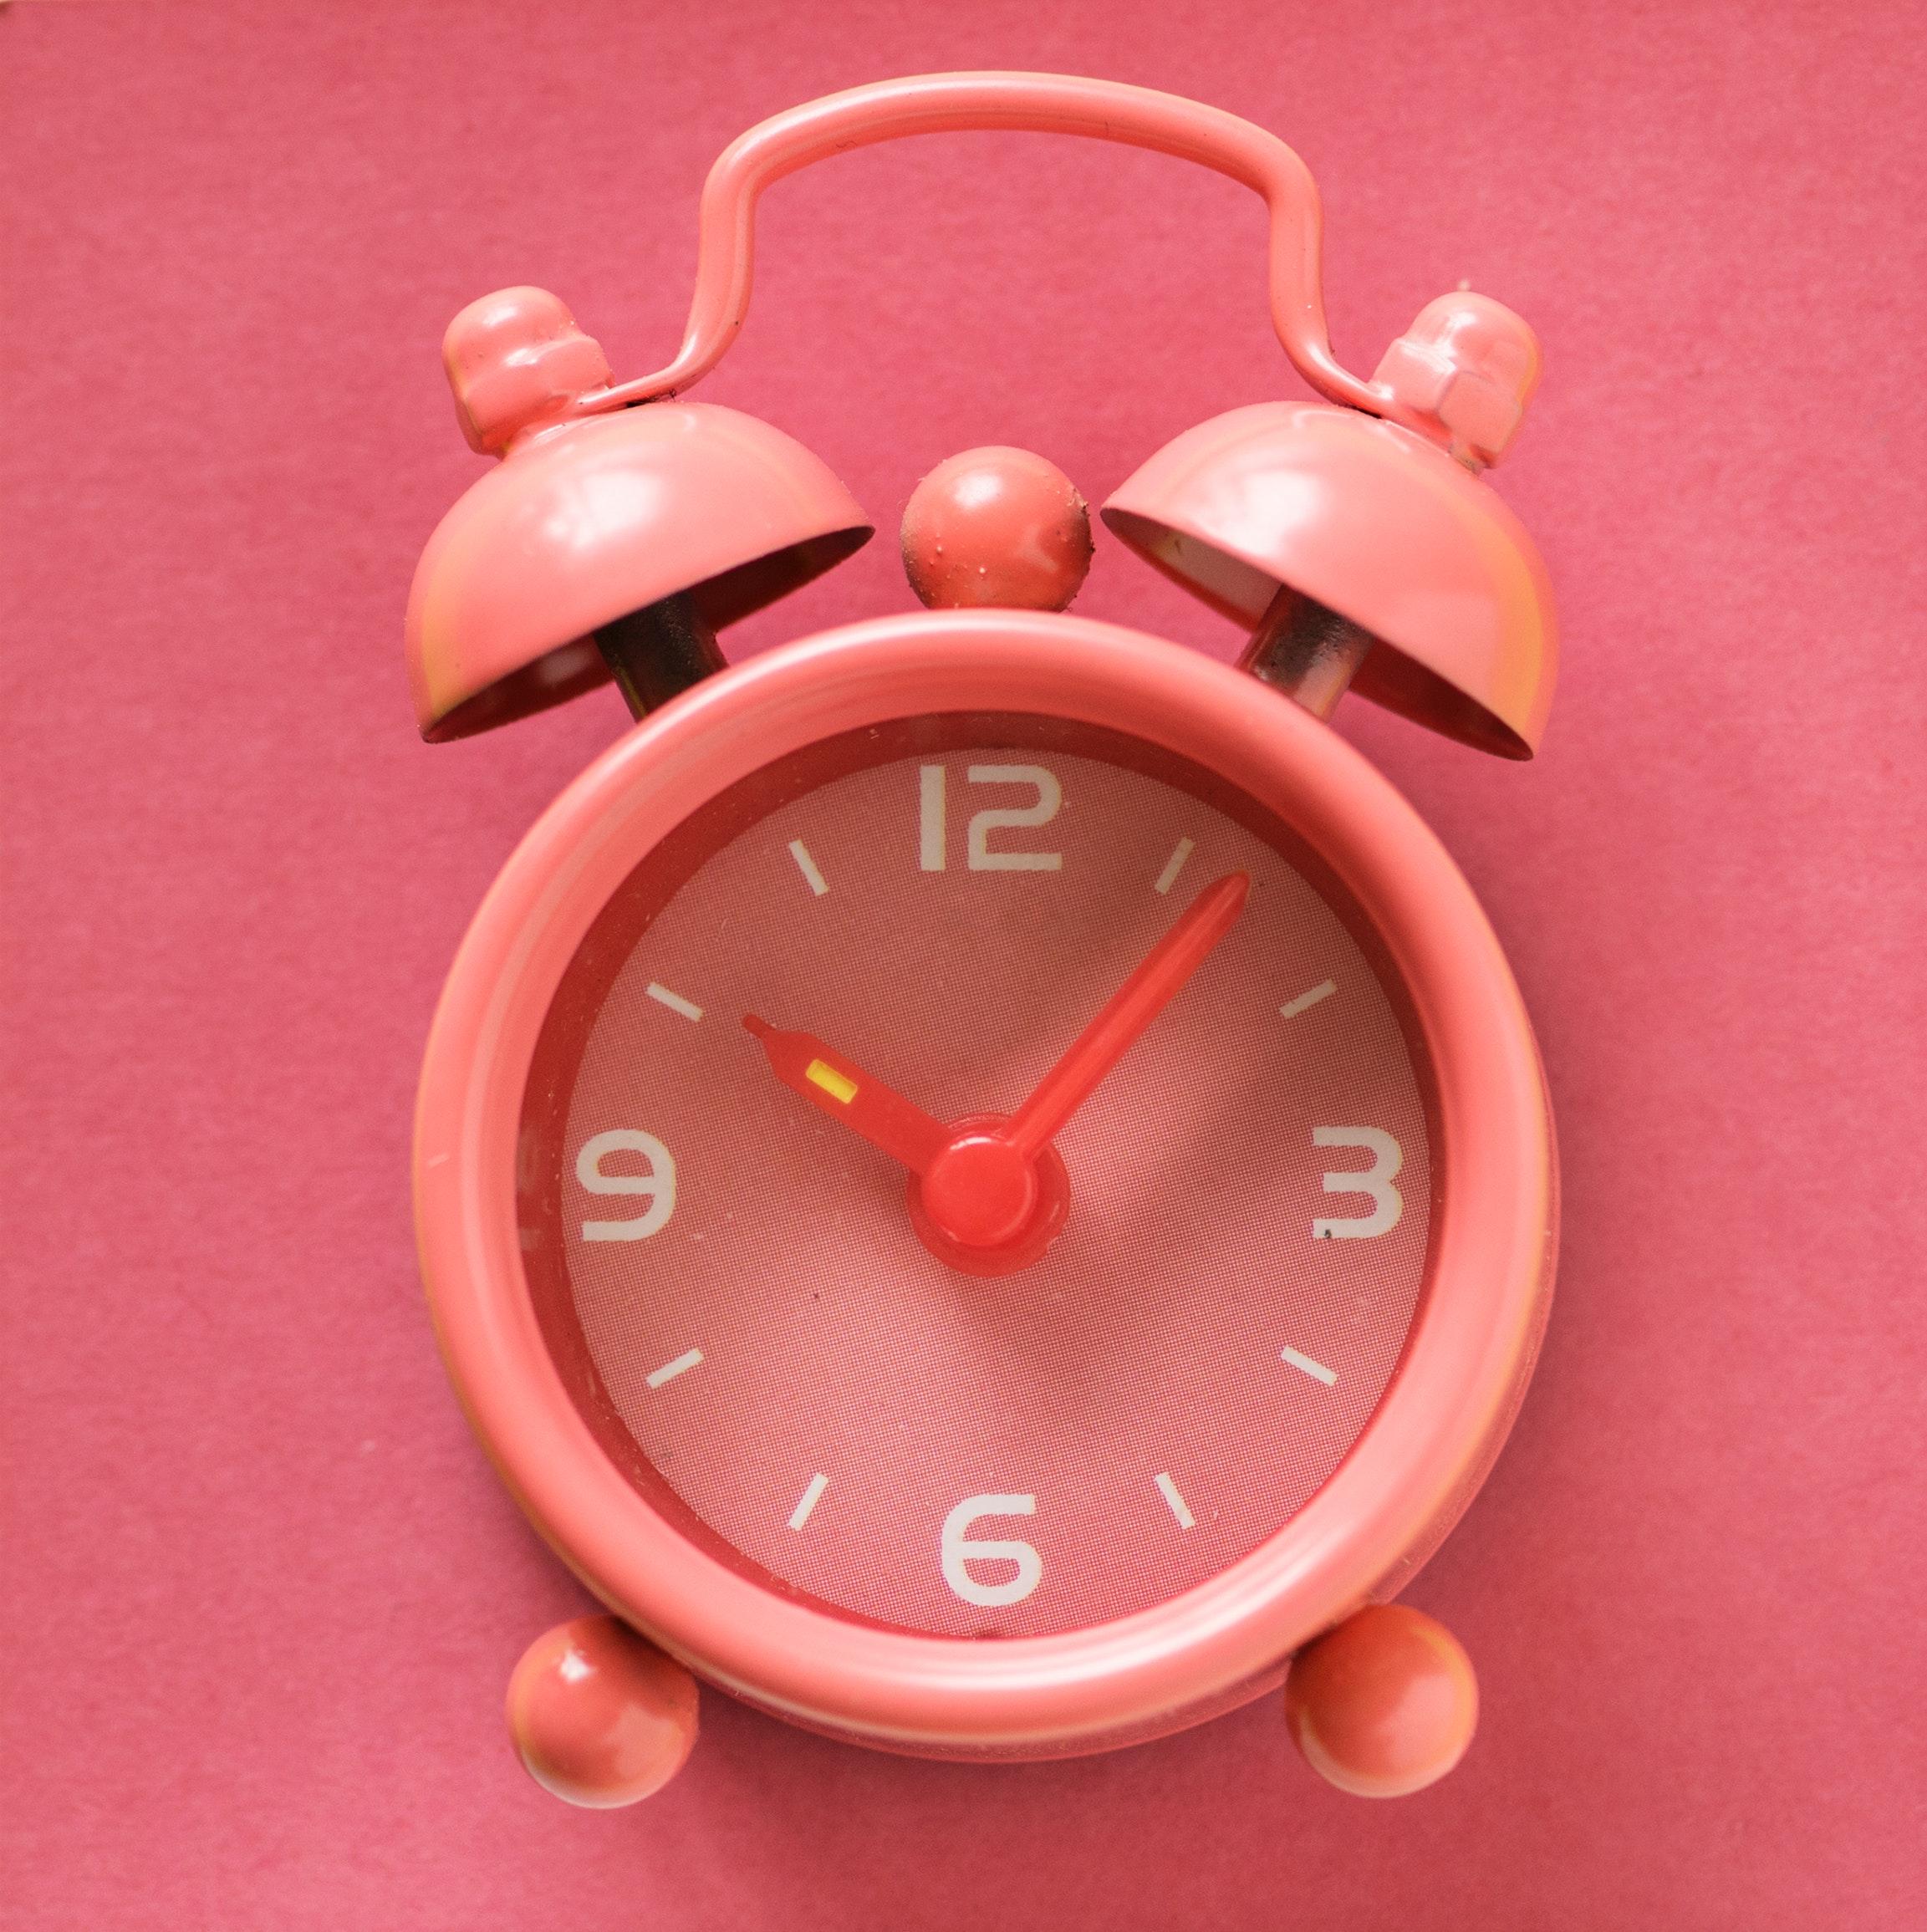 alarm-clock-analog-analogue-1065712